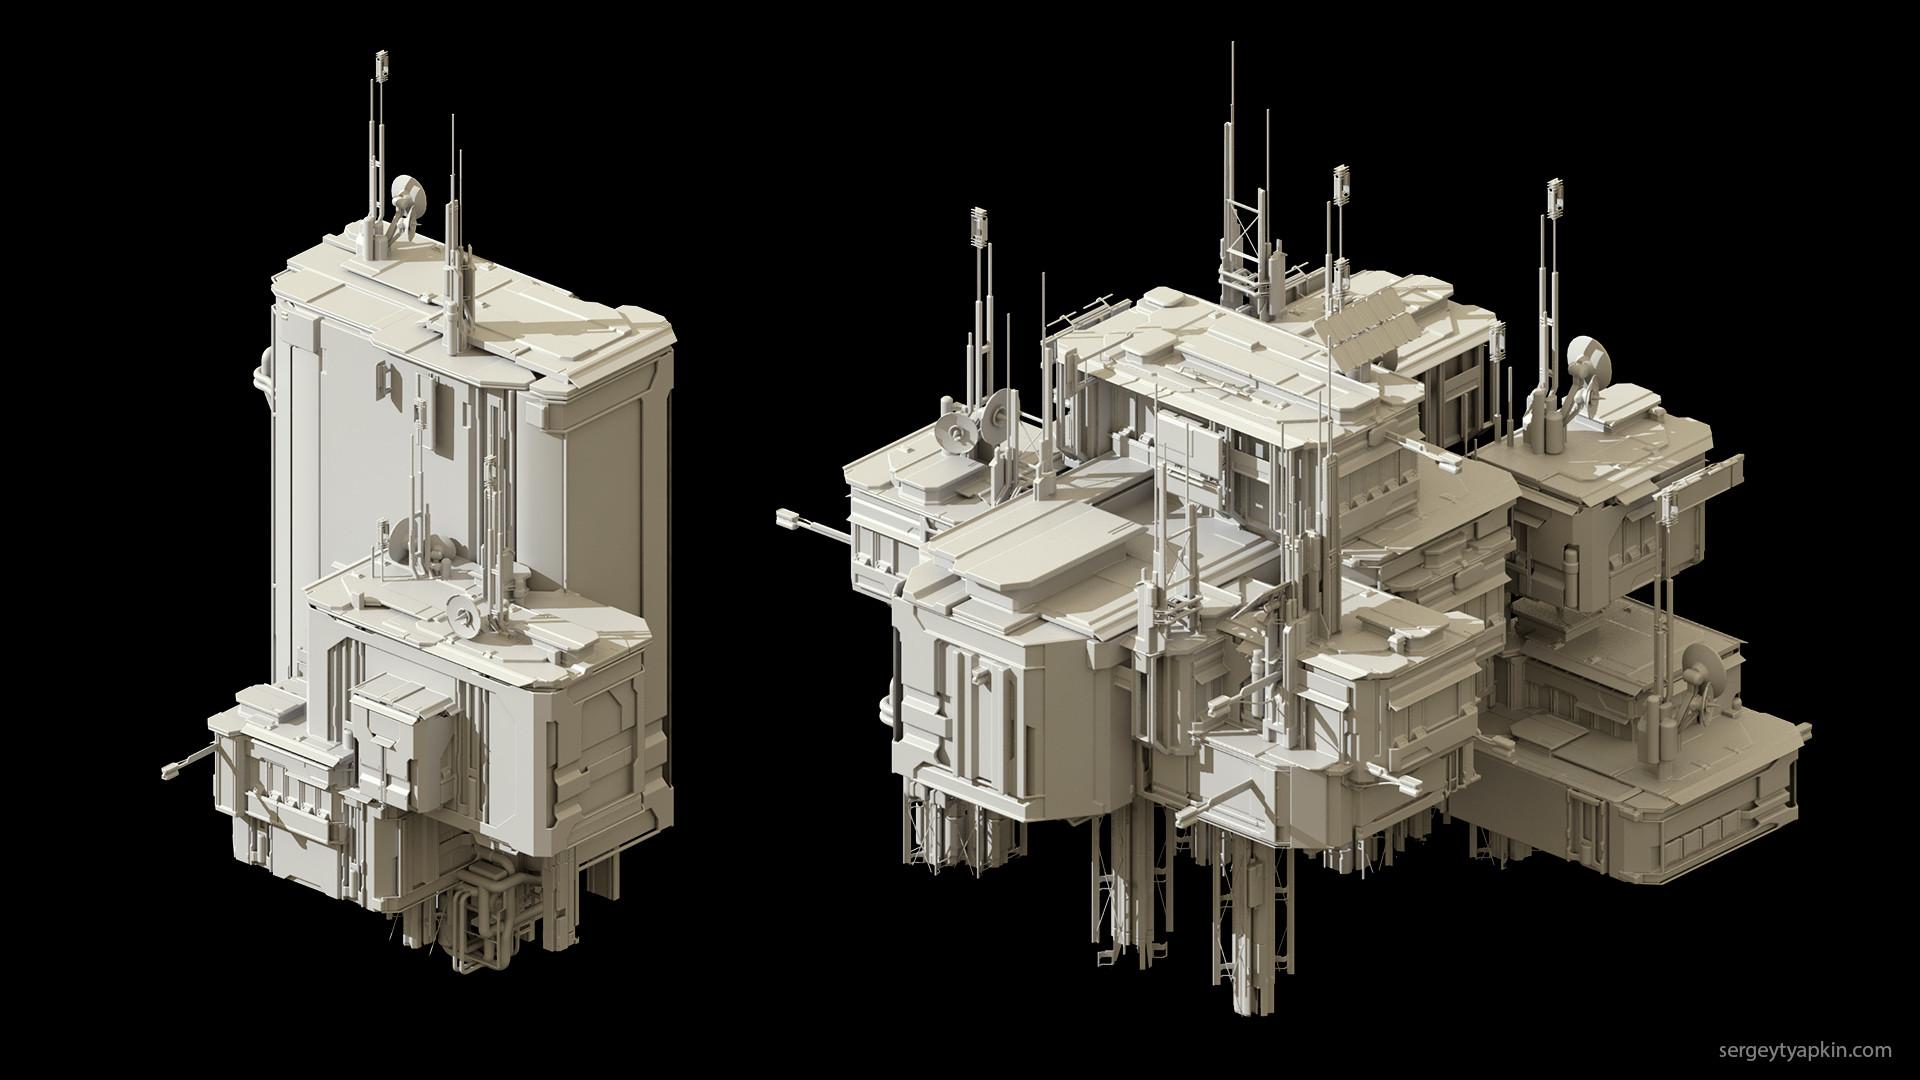 Sergey tyapkin buildings render 3